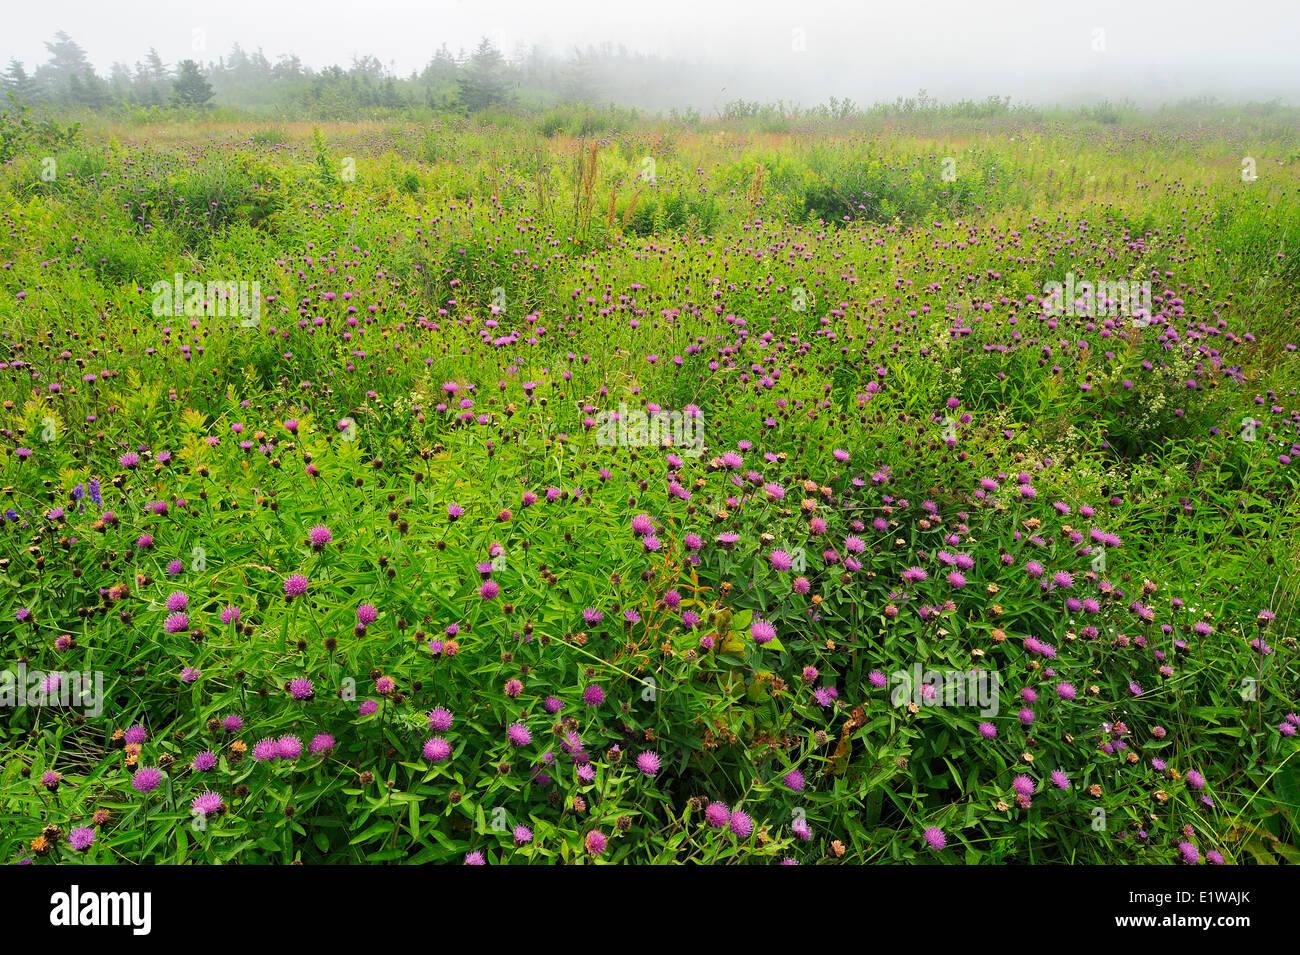 Thistles at Pond Cove, Brier Island, Nova Scotia, Canada - Stock Image